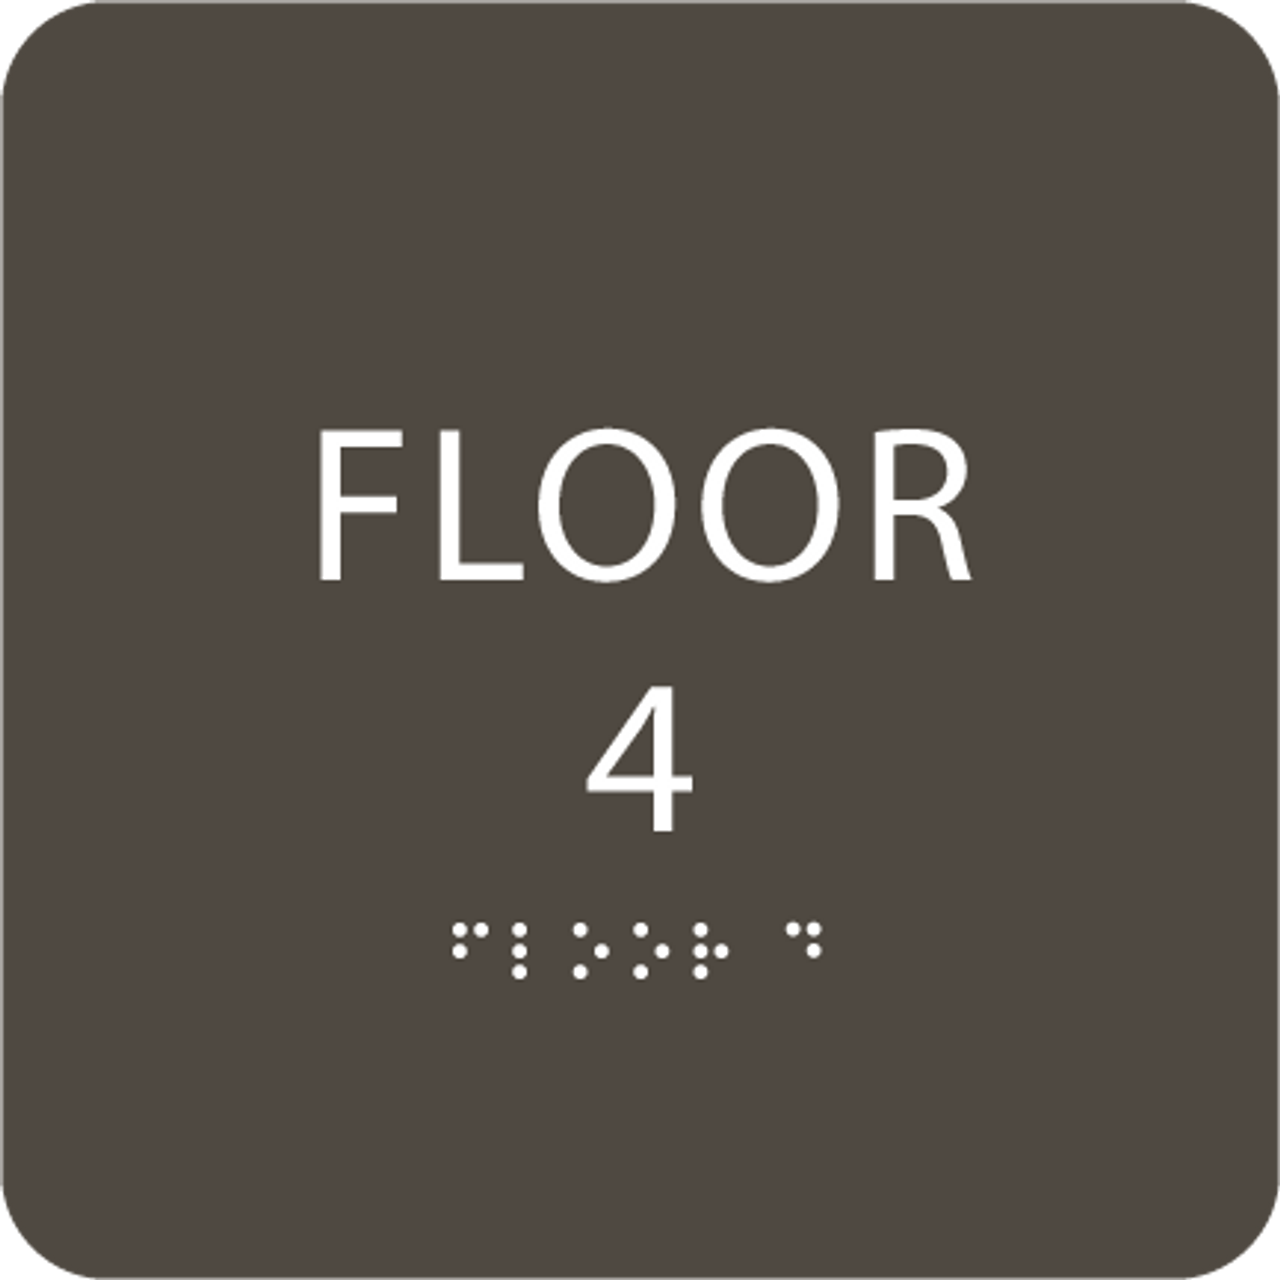 Olive Floor 4 Identification Sign